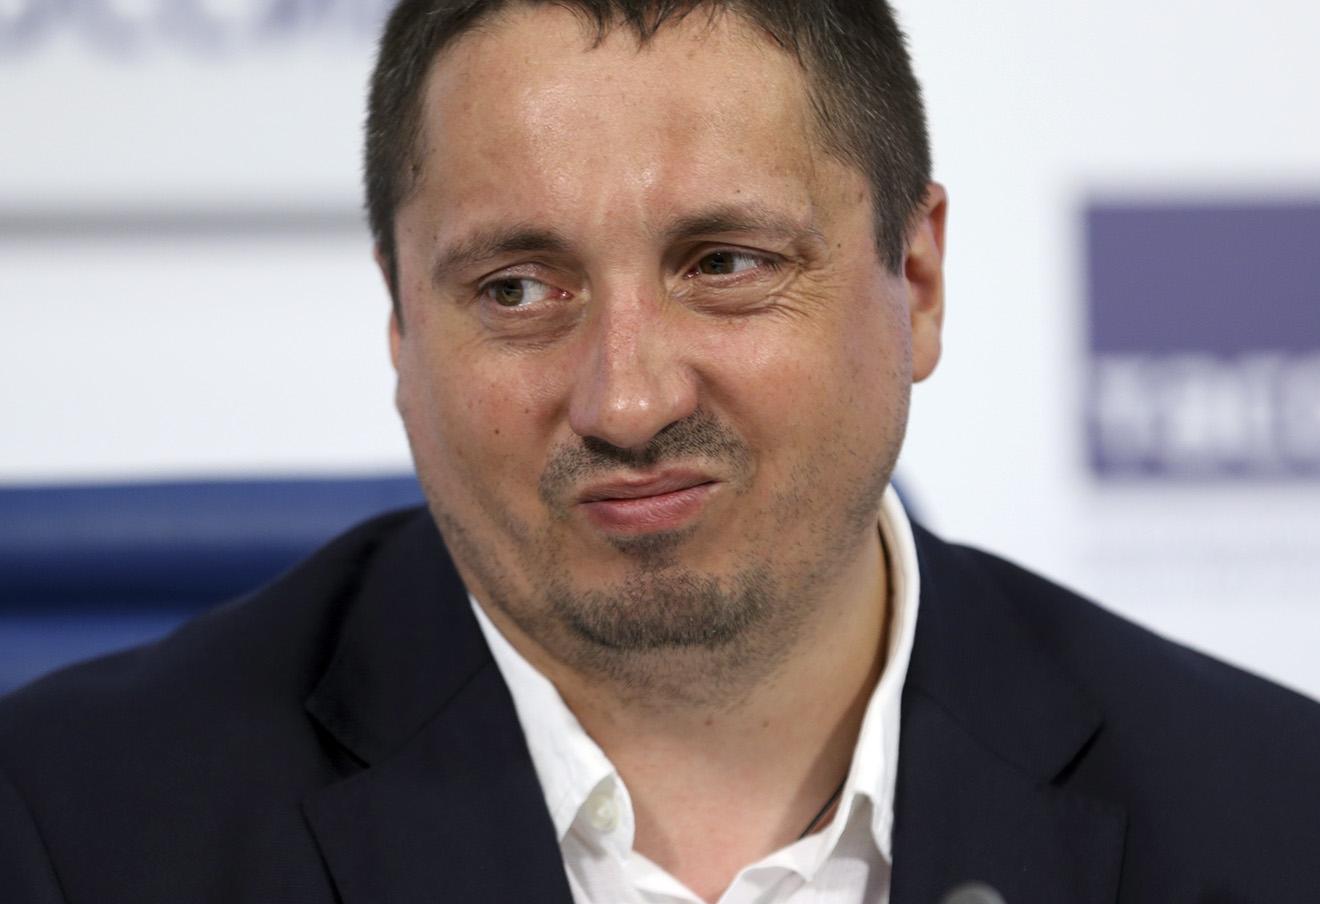 Александр Шпрыгин. Фото: Михаил Почуев / ТАСС